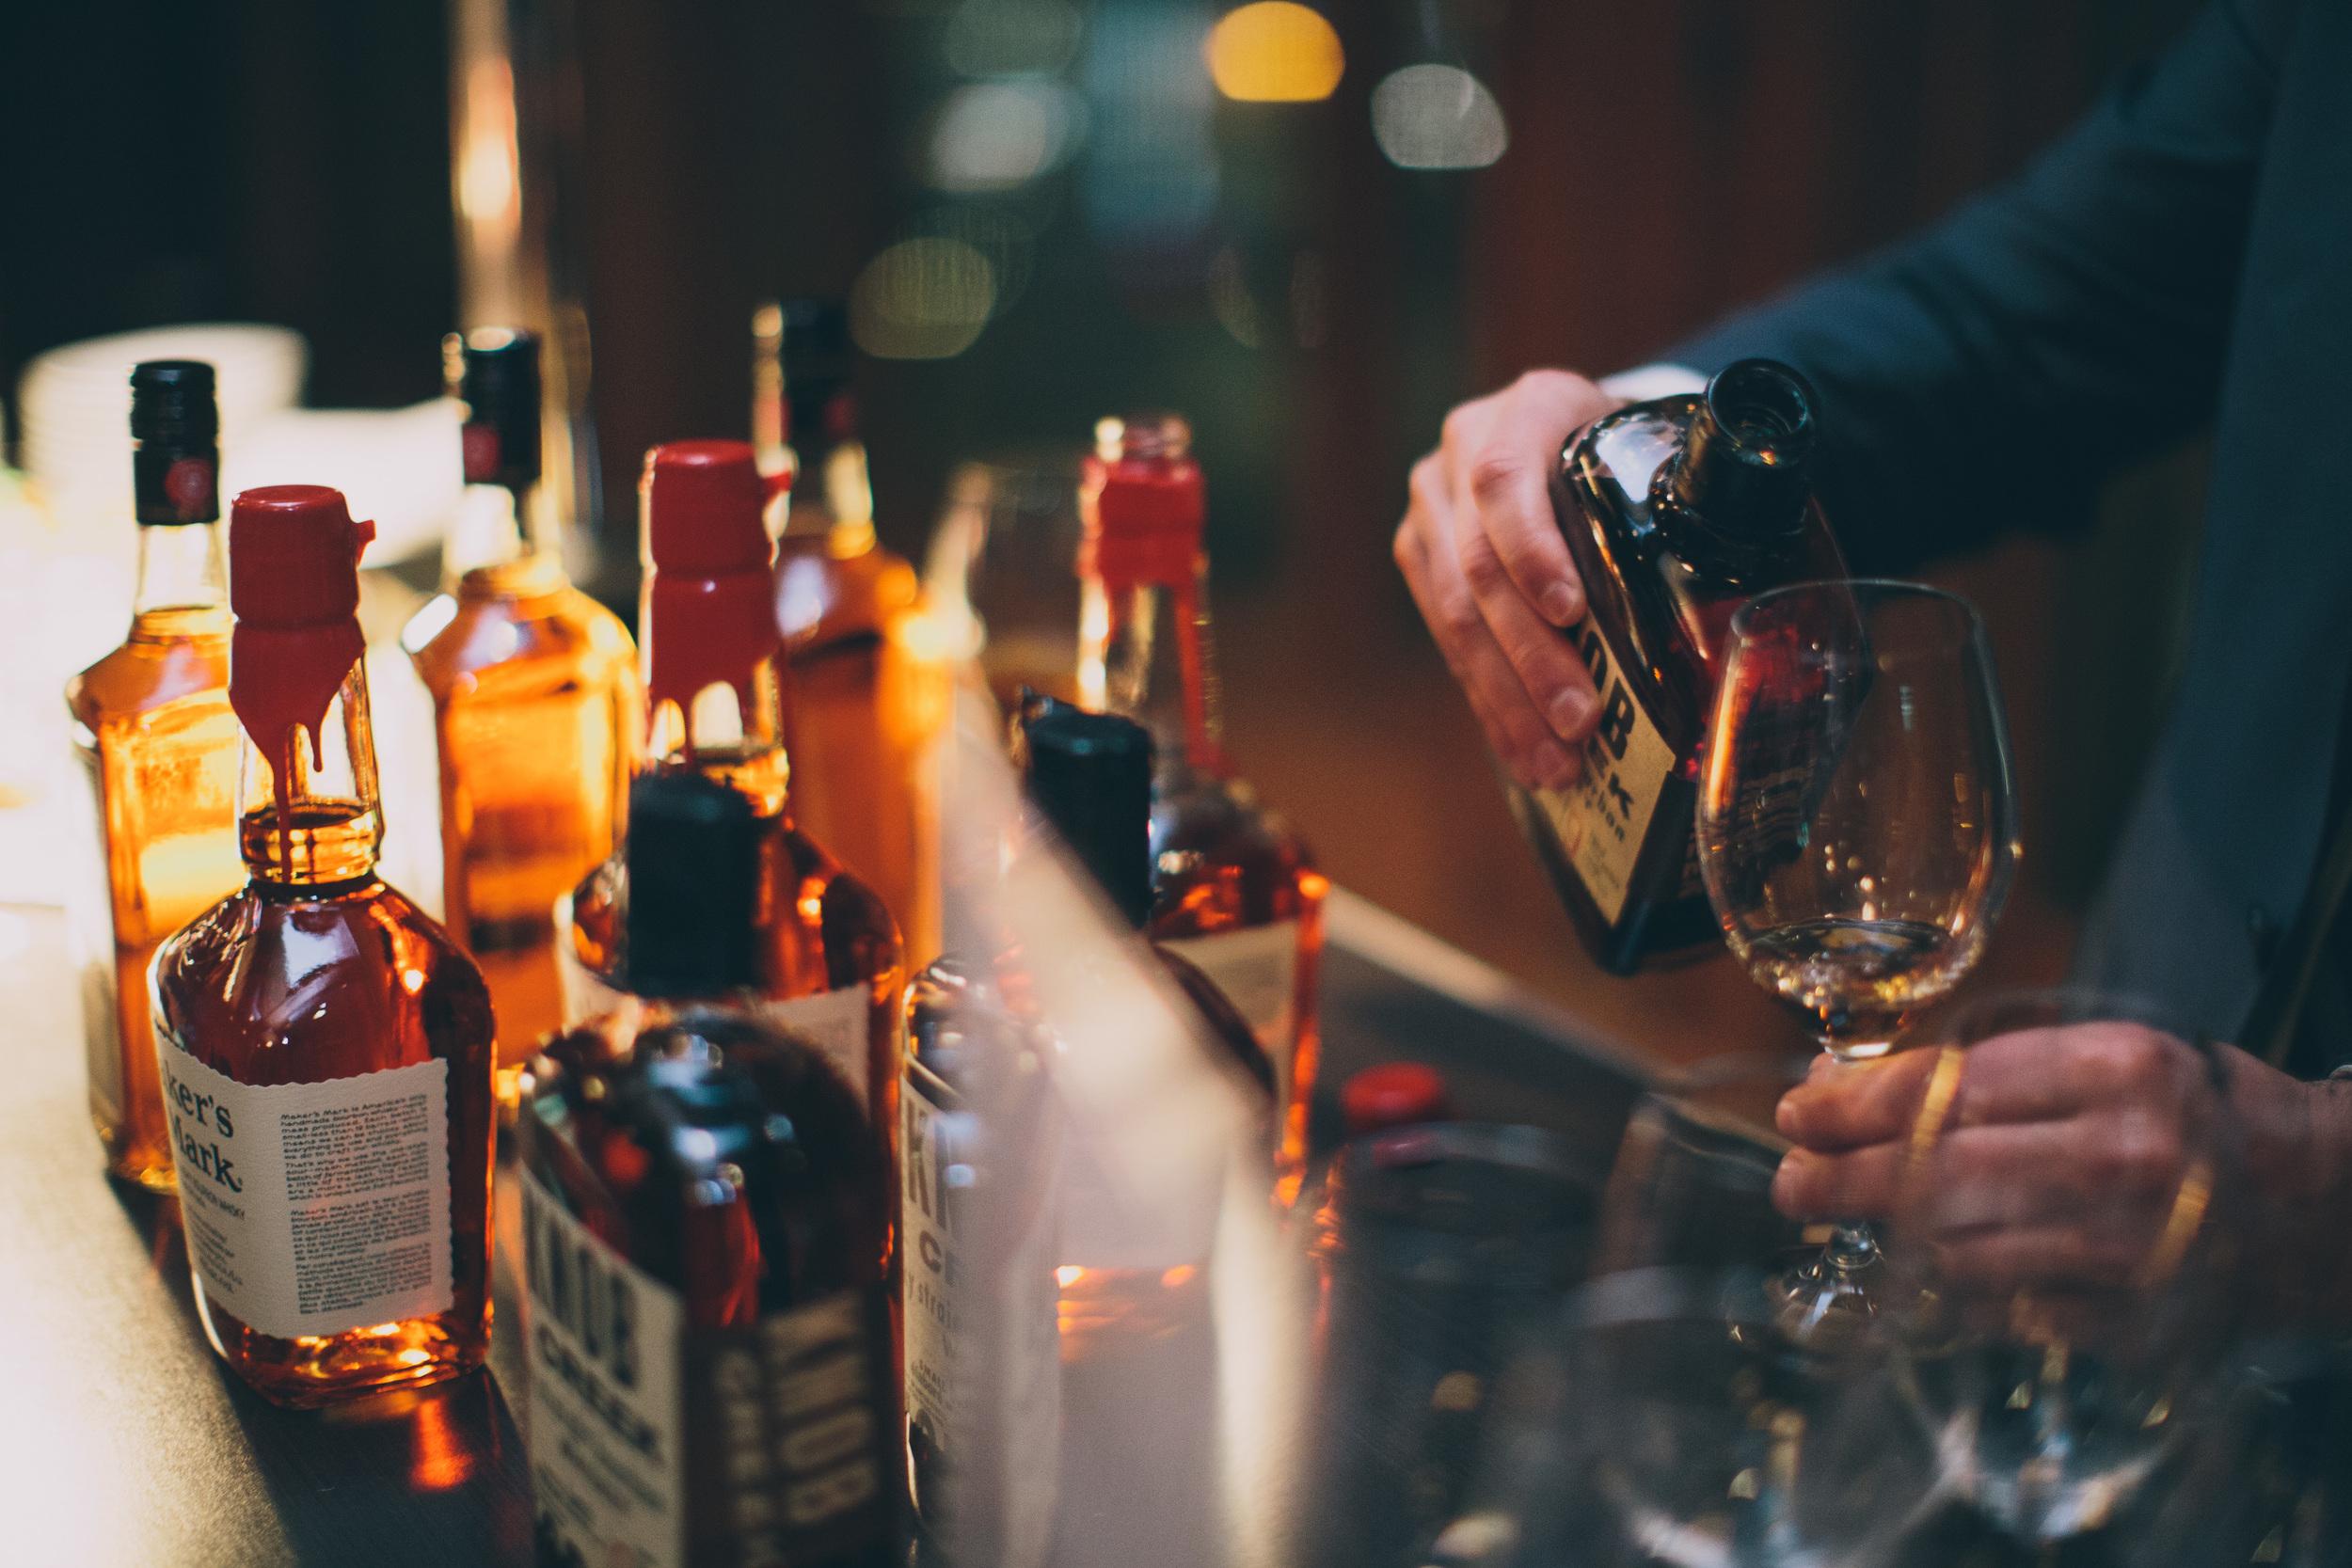 WhiskeyWisemen2015_0032.jpg